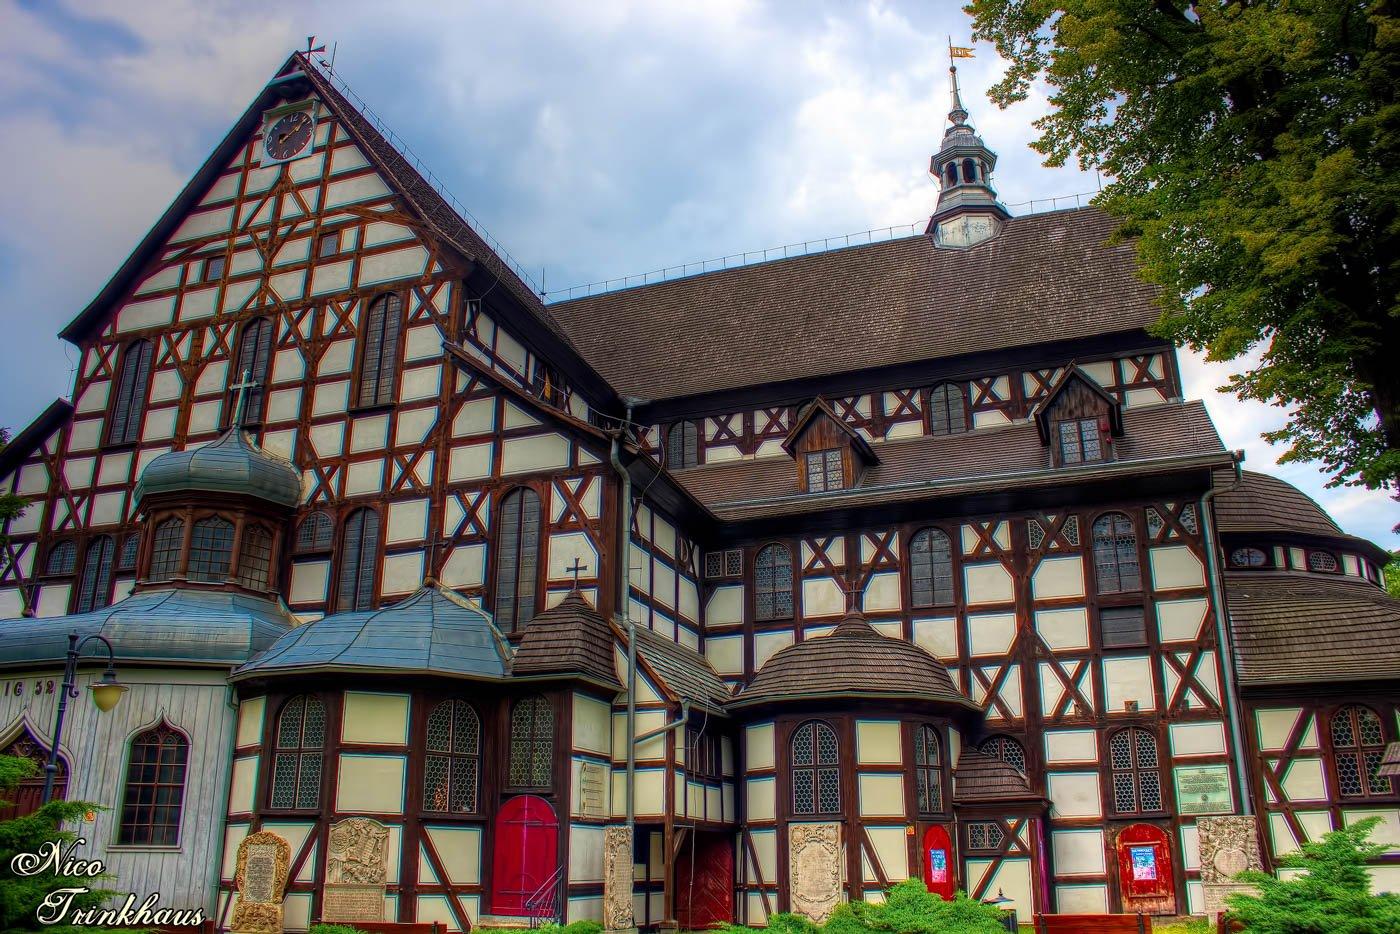 Church of Peace in Swidnica in Poland